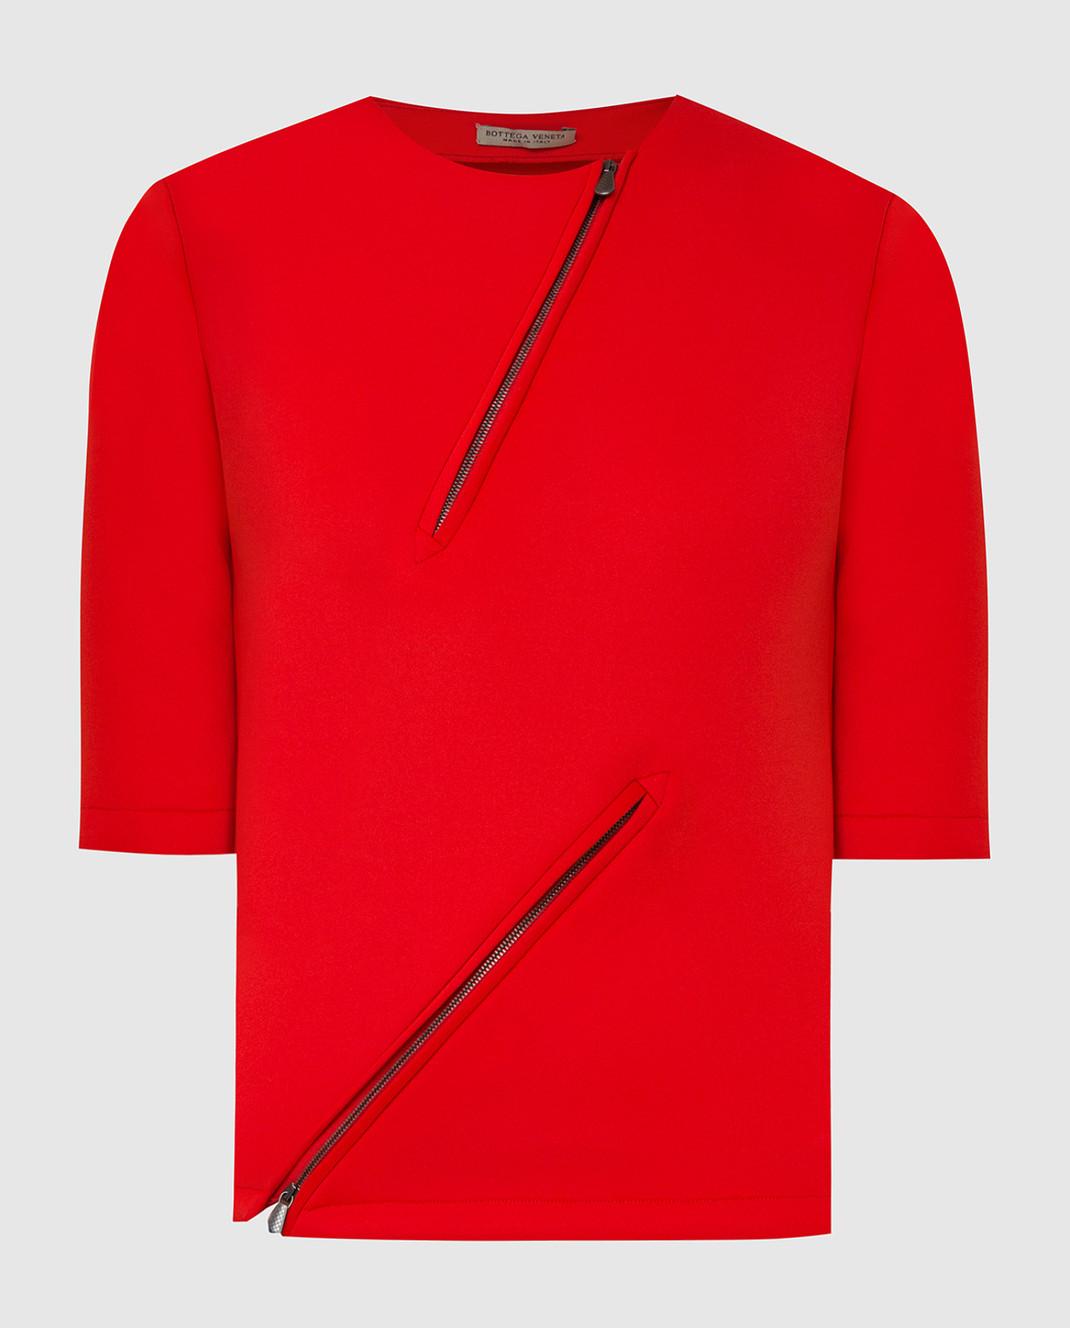 Bottega Veneta Красная футболка 405392